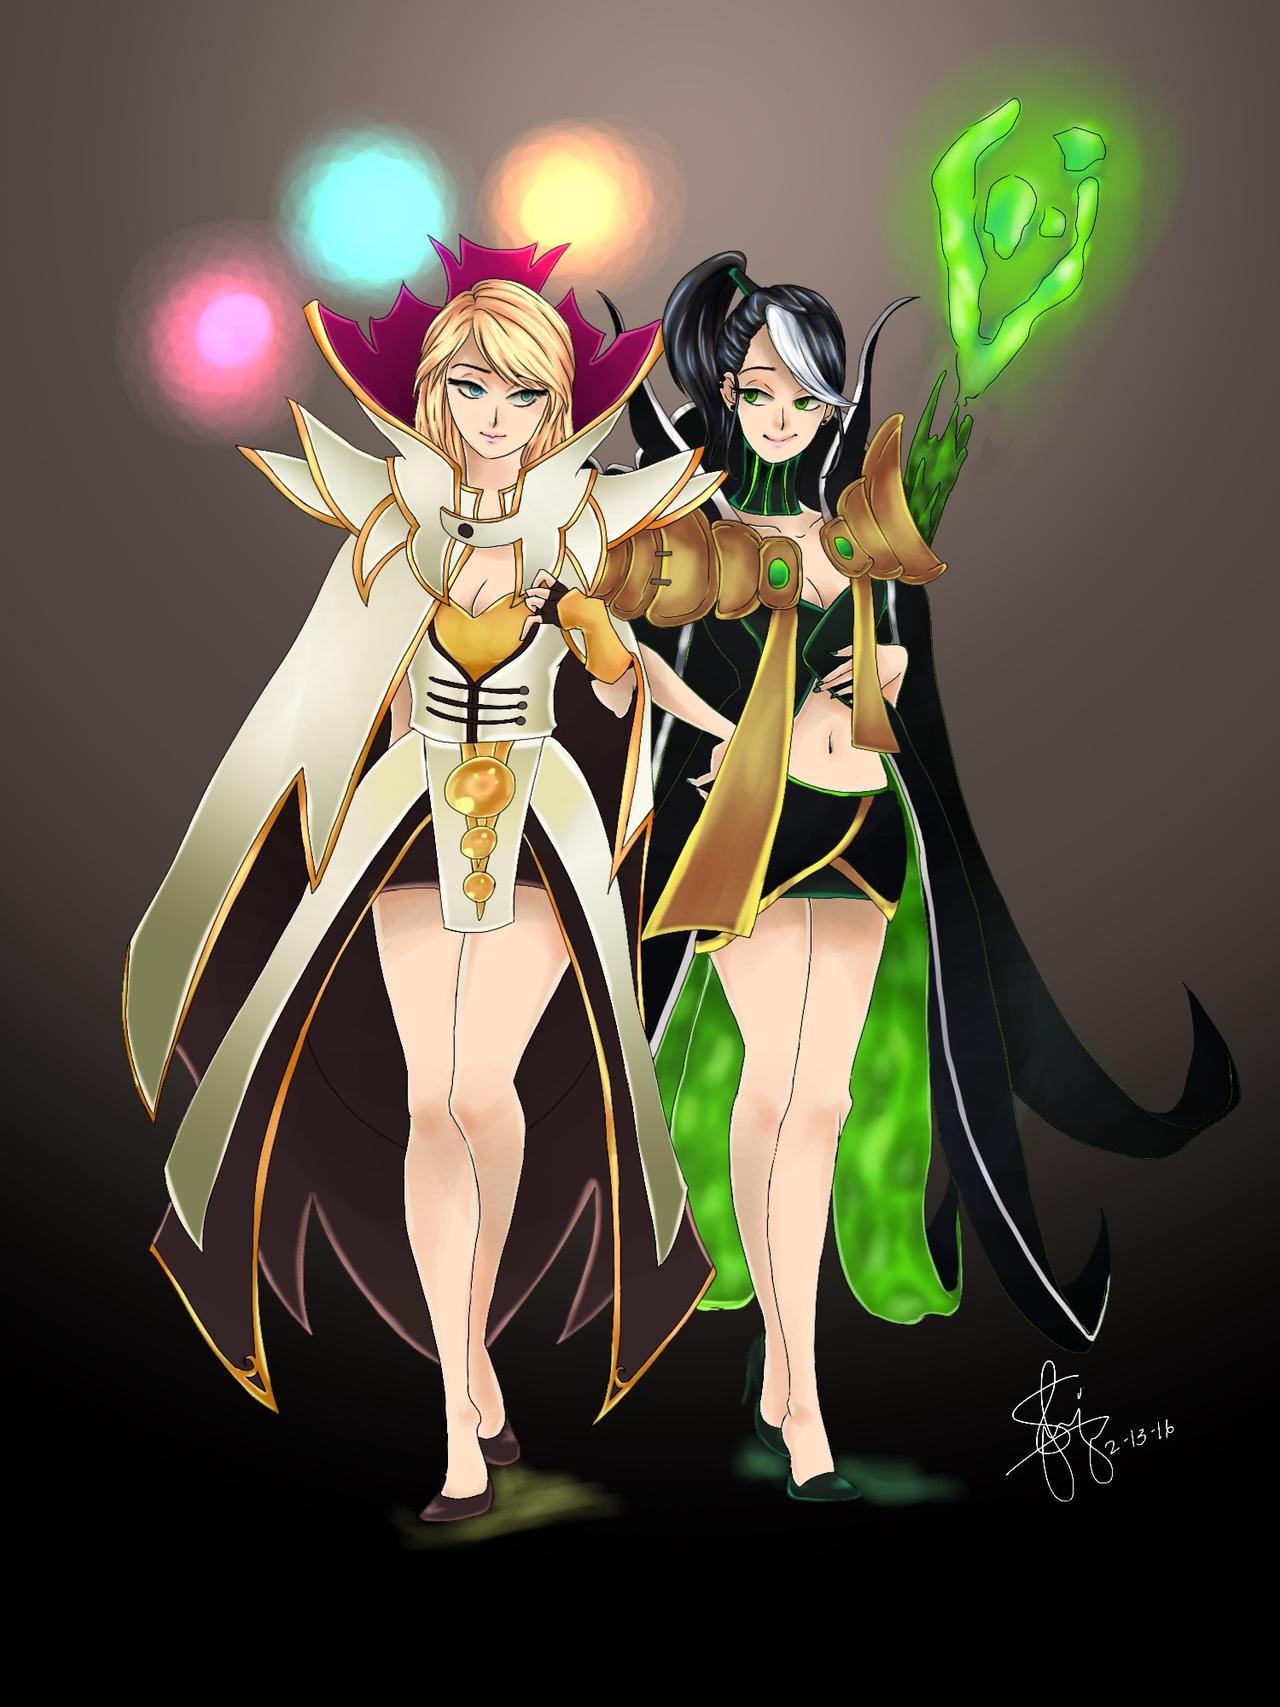 Invoker and Rubick - Female versions by RueYumi on DeviantArt